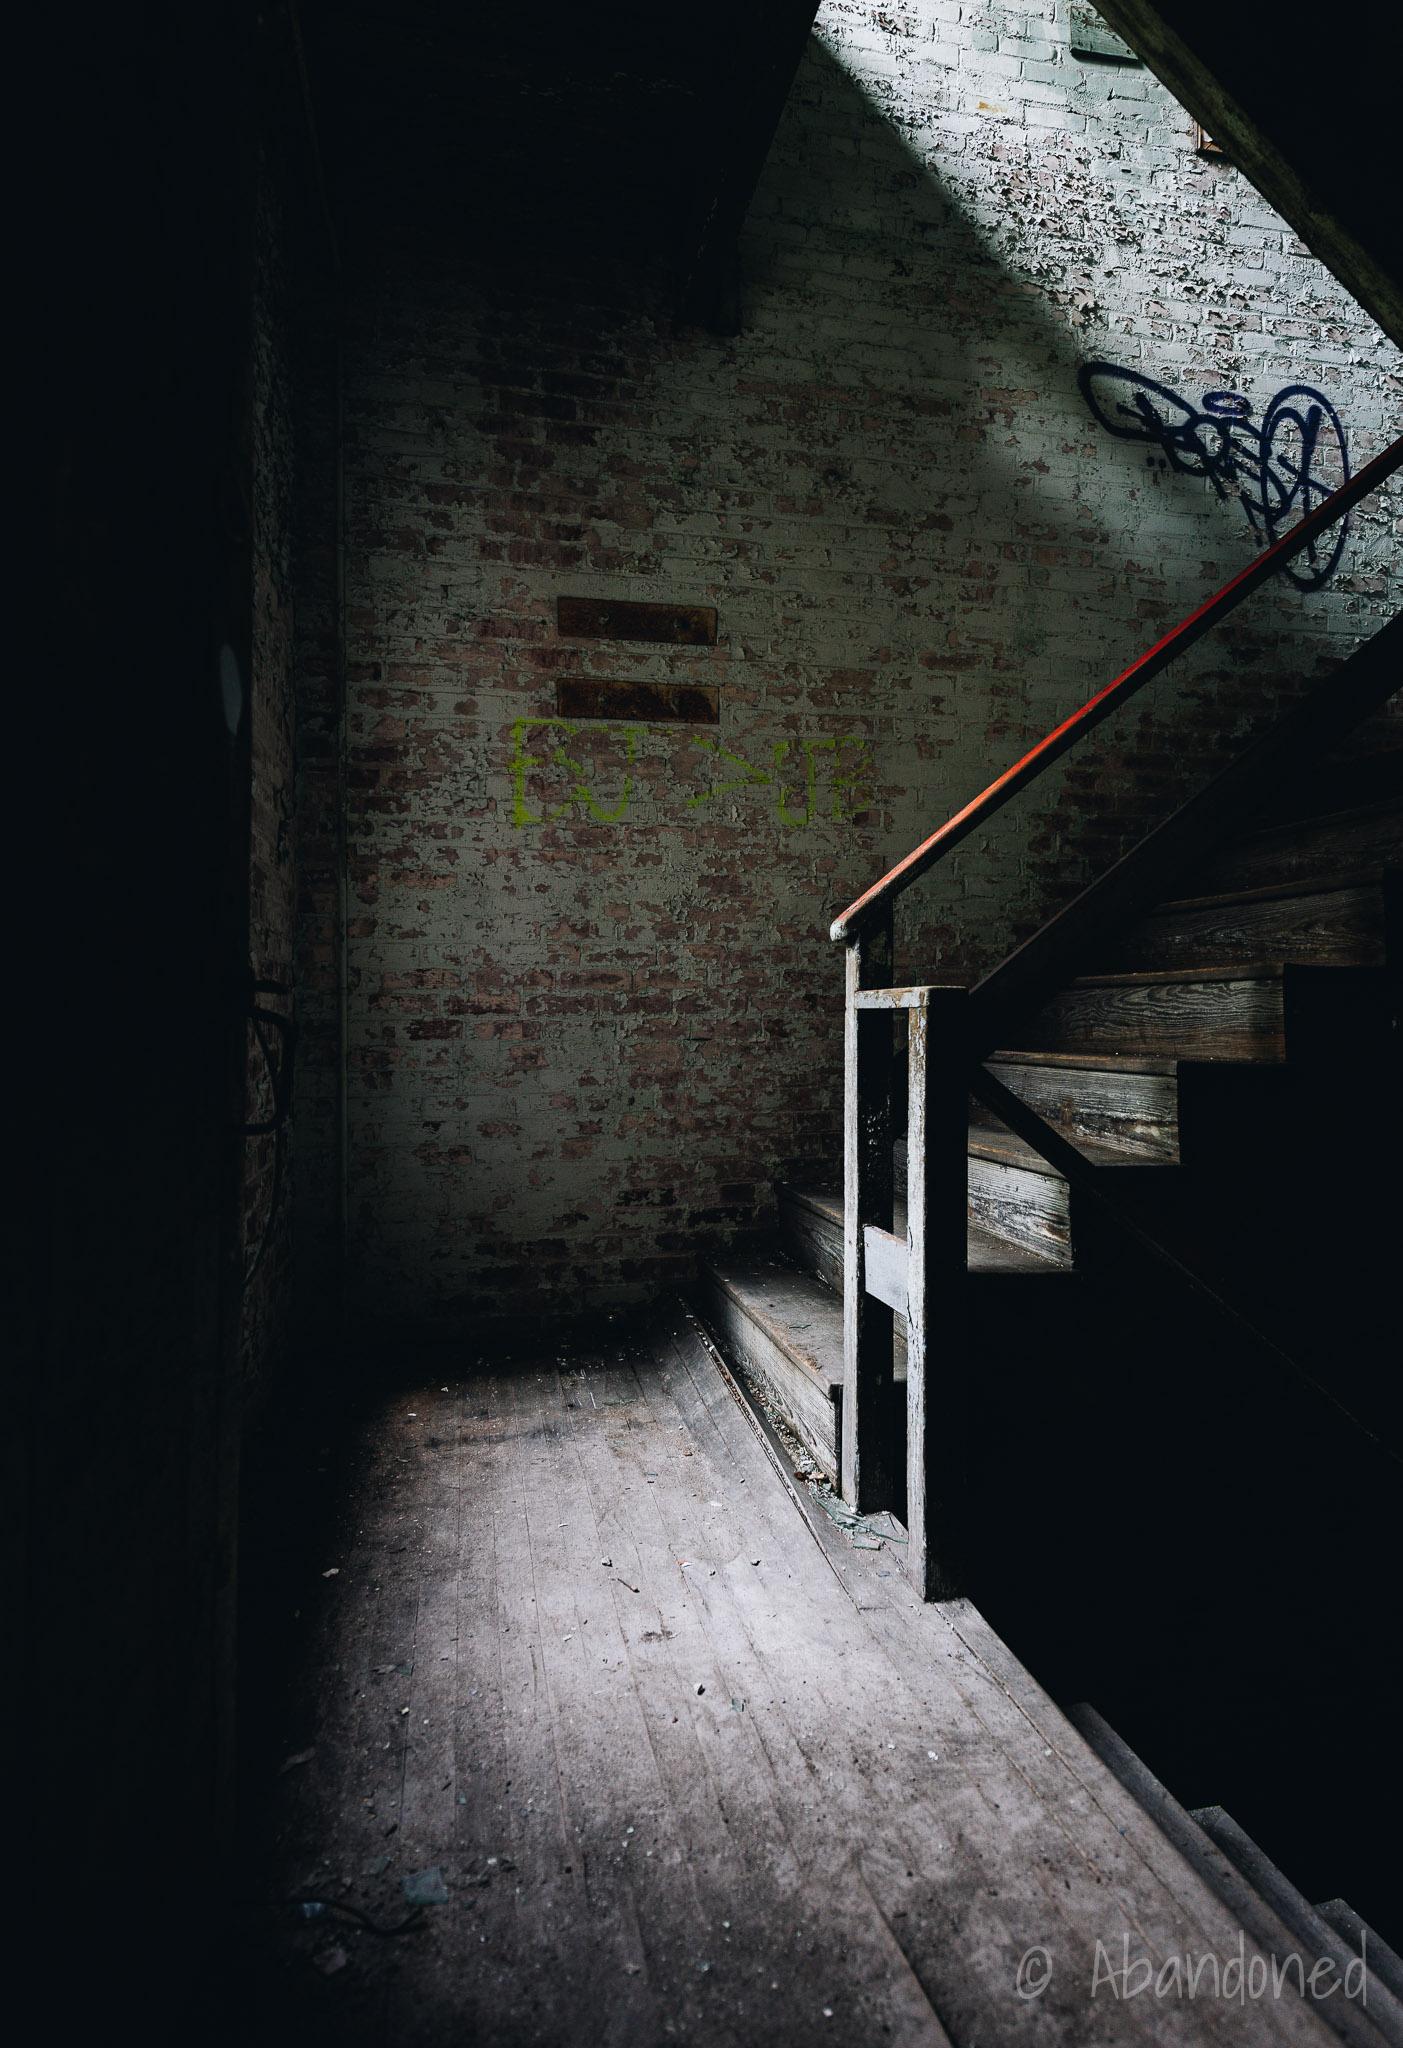 O'Hara Waltham Dial Company Stairwell